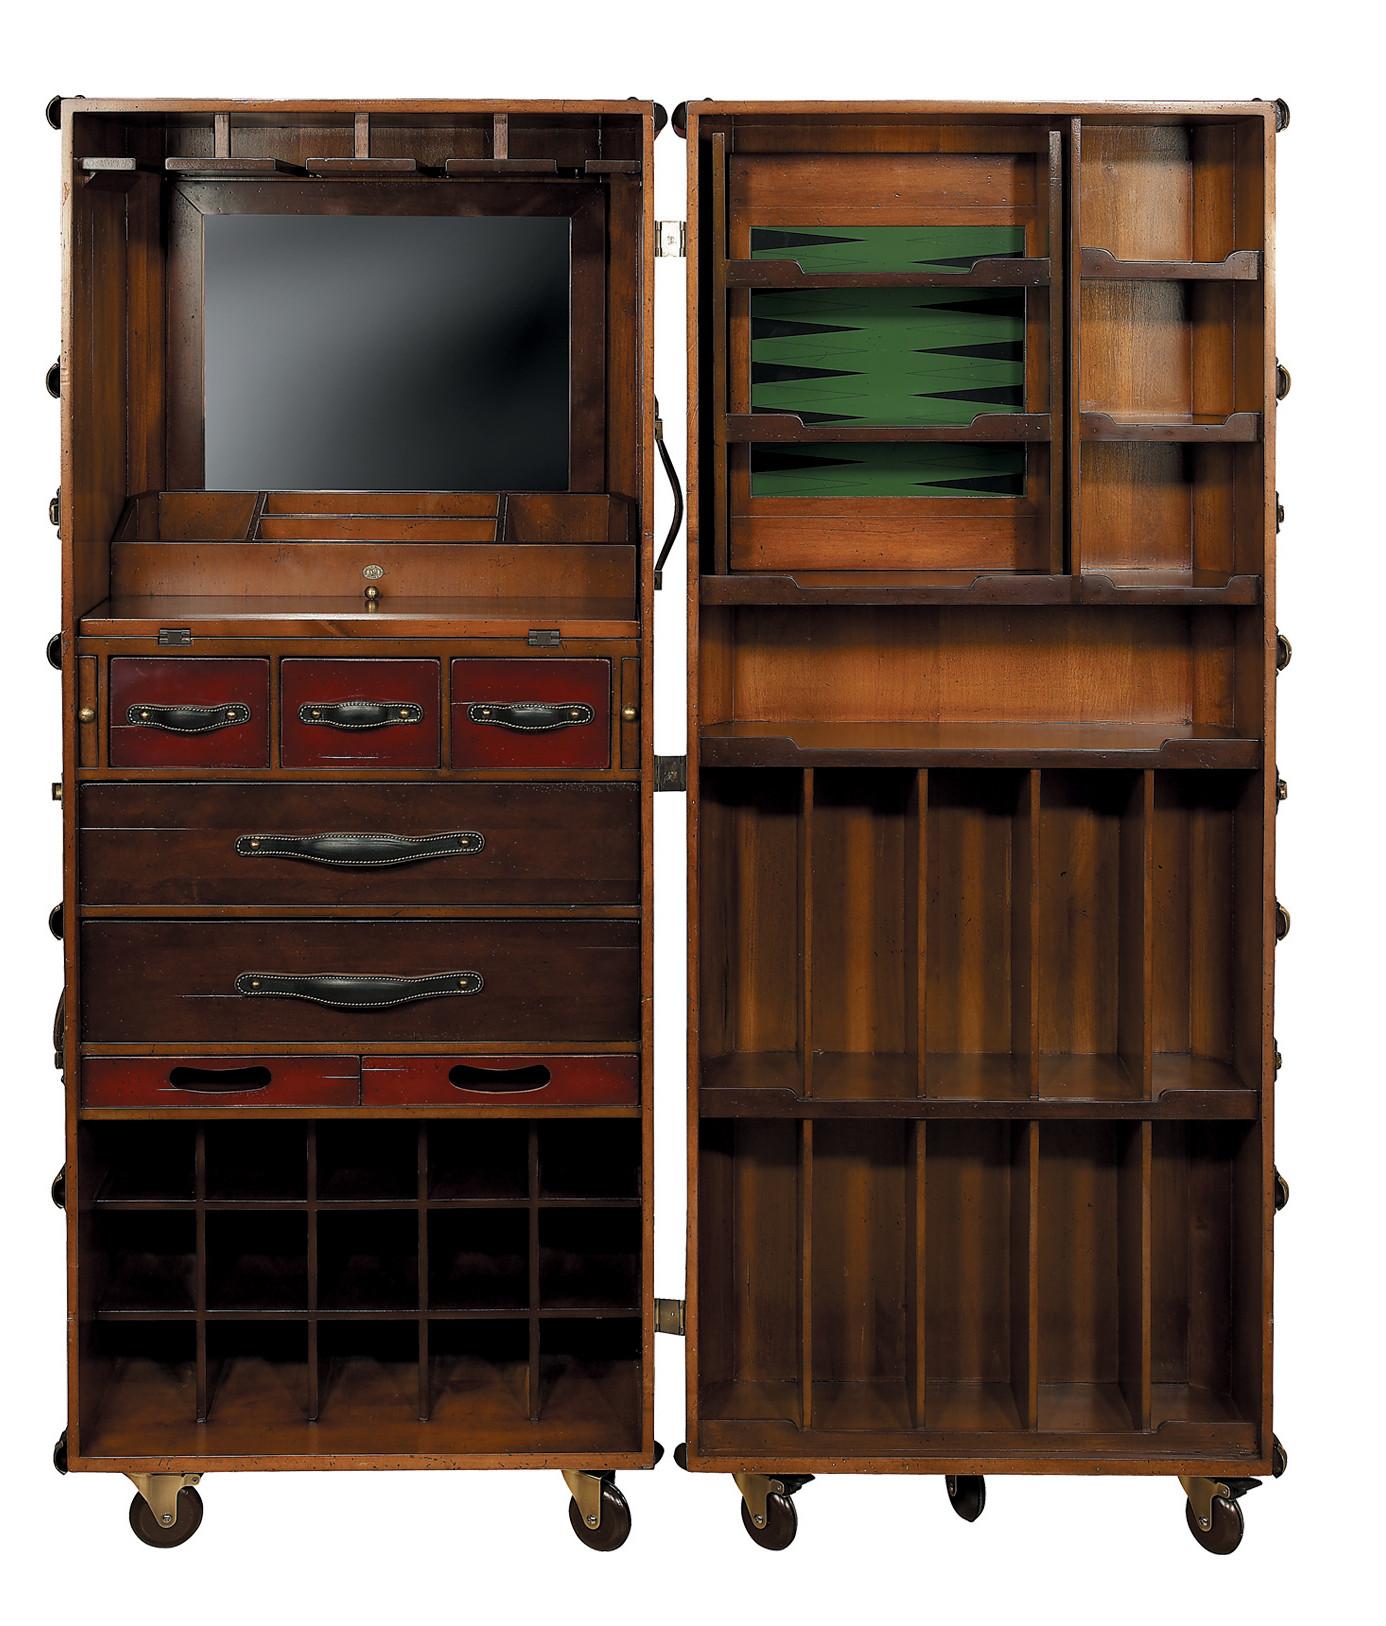 malle de cabine bar shop latitude deco. Black Bedroom Furniture Sets. Home Design Ideas